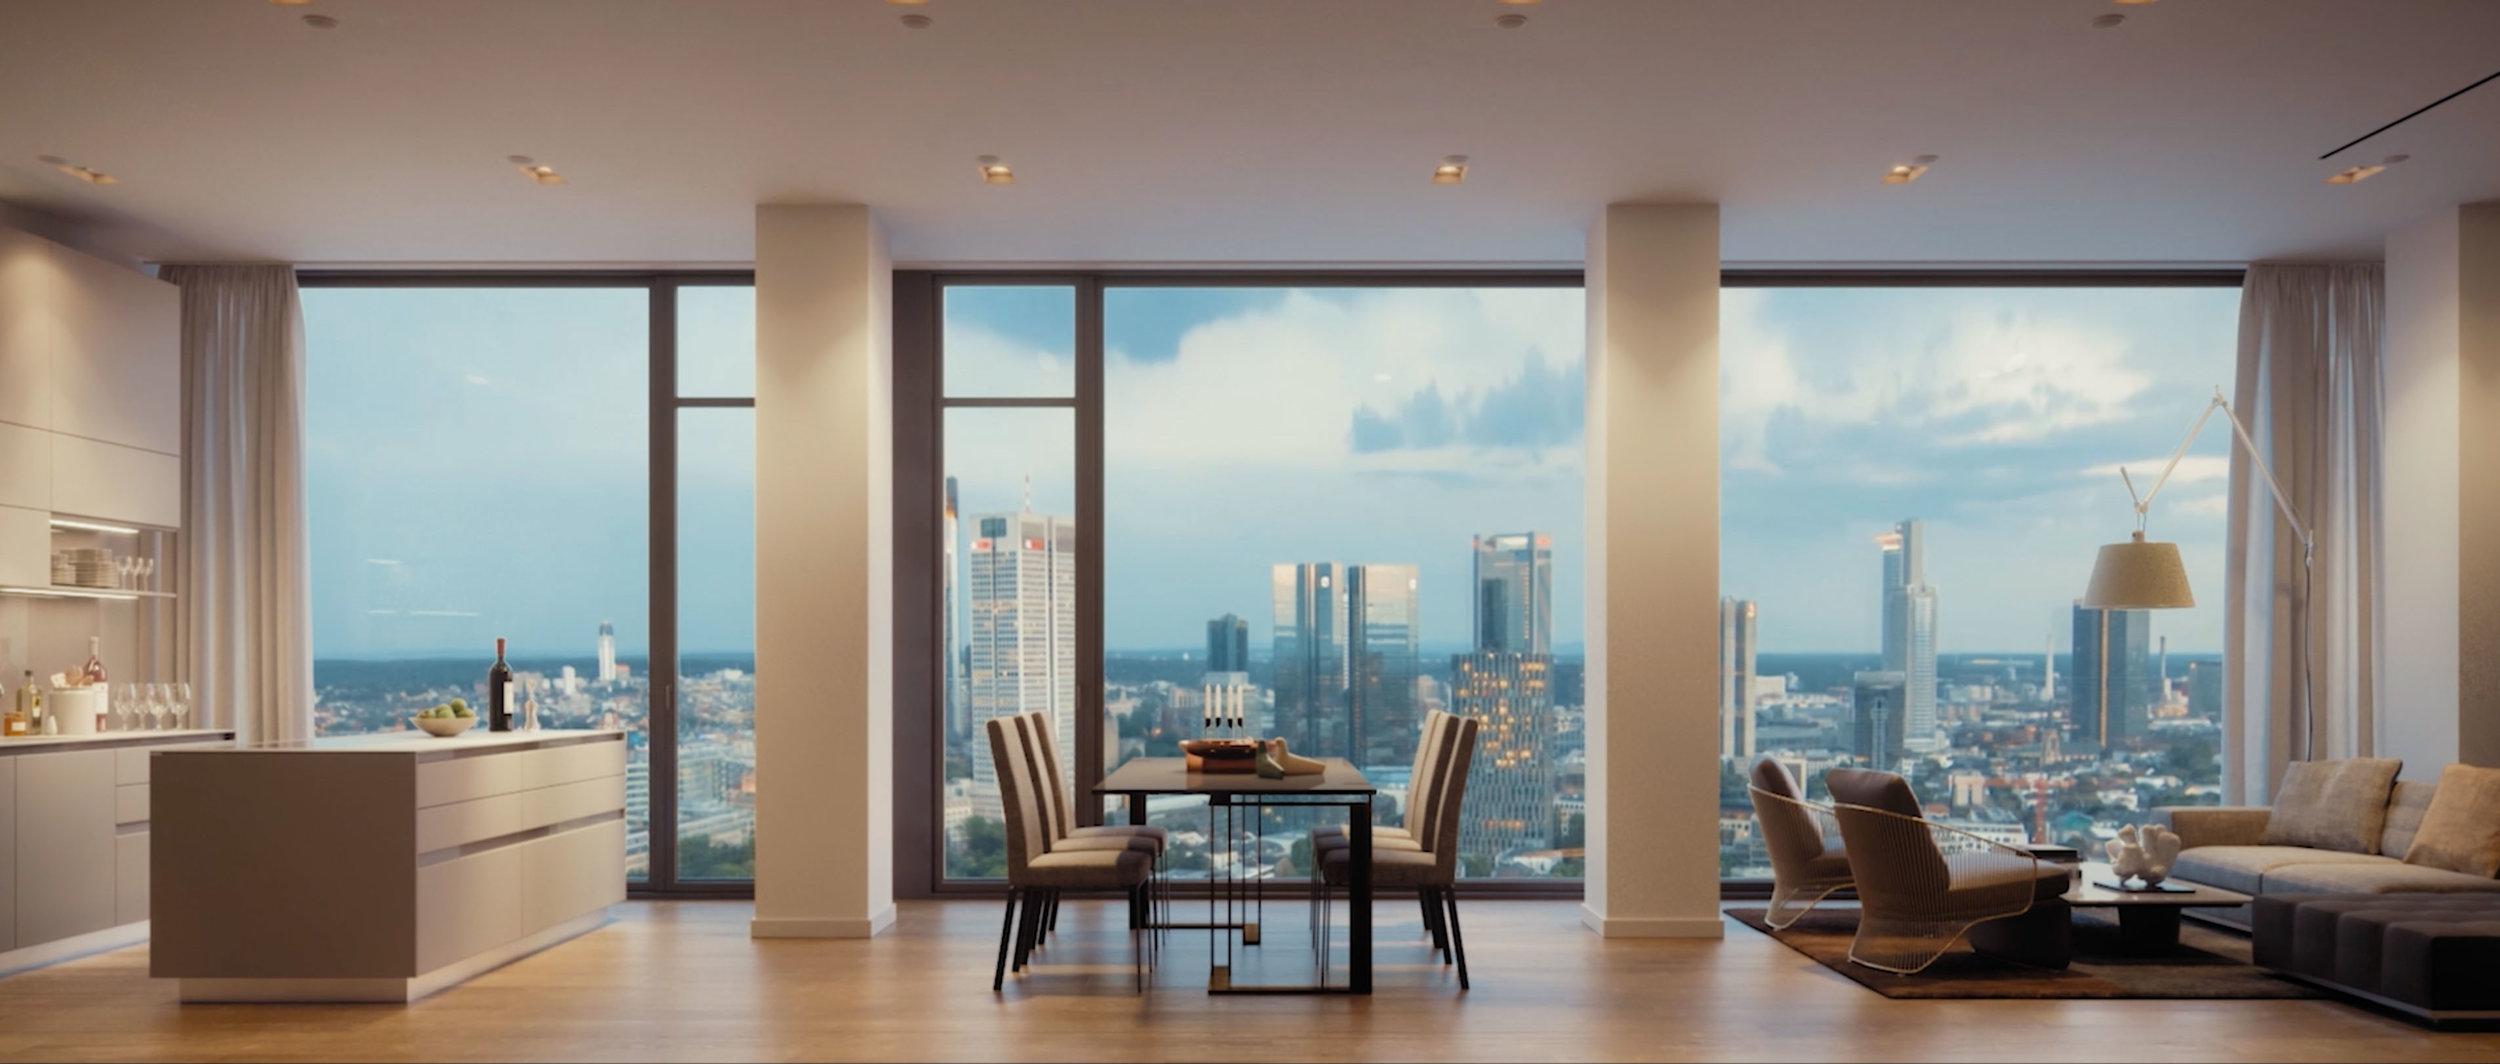 160-ParkView-Architecture-Frankfurt-New-Men-Talk-Business_02.jpg